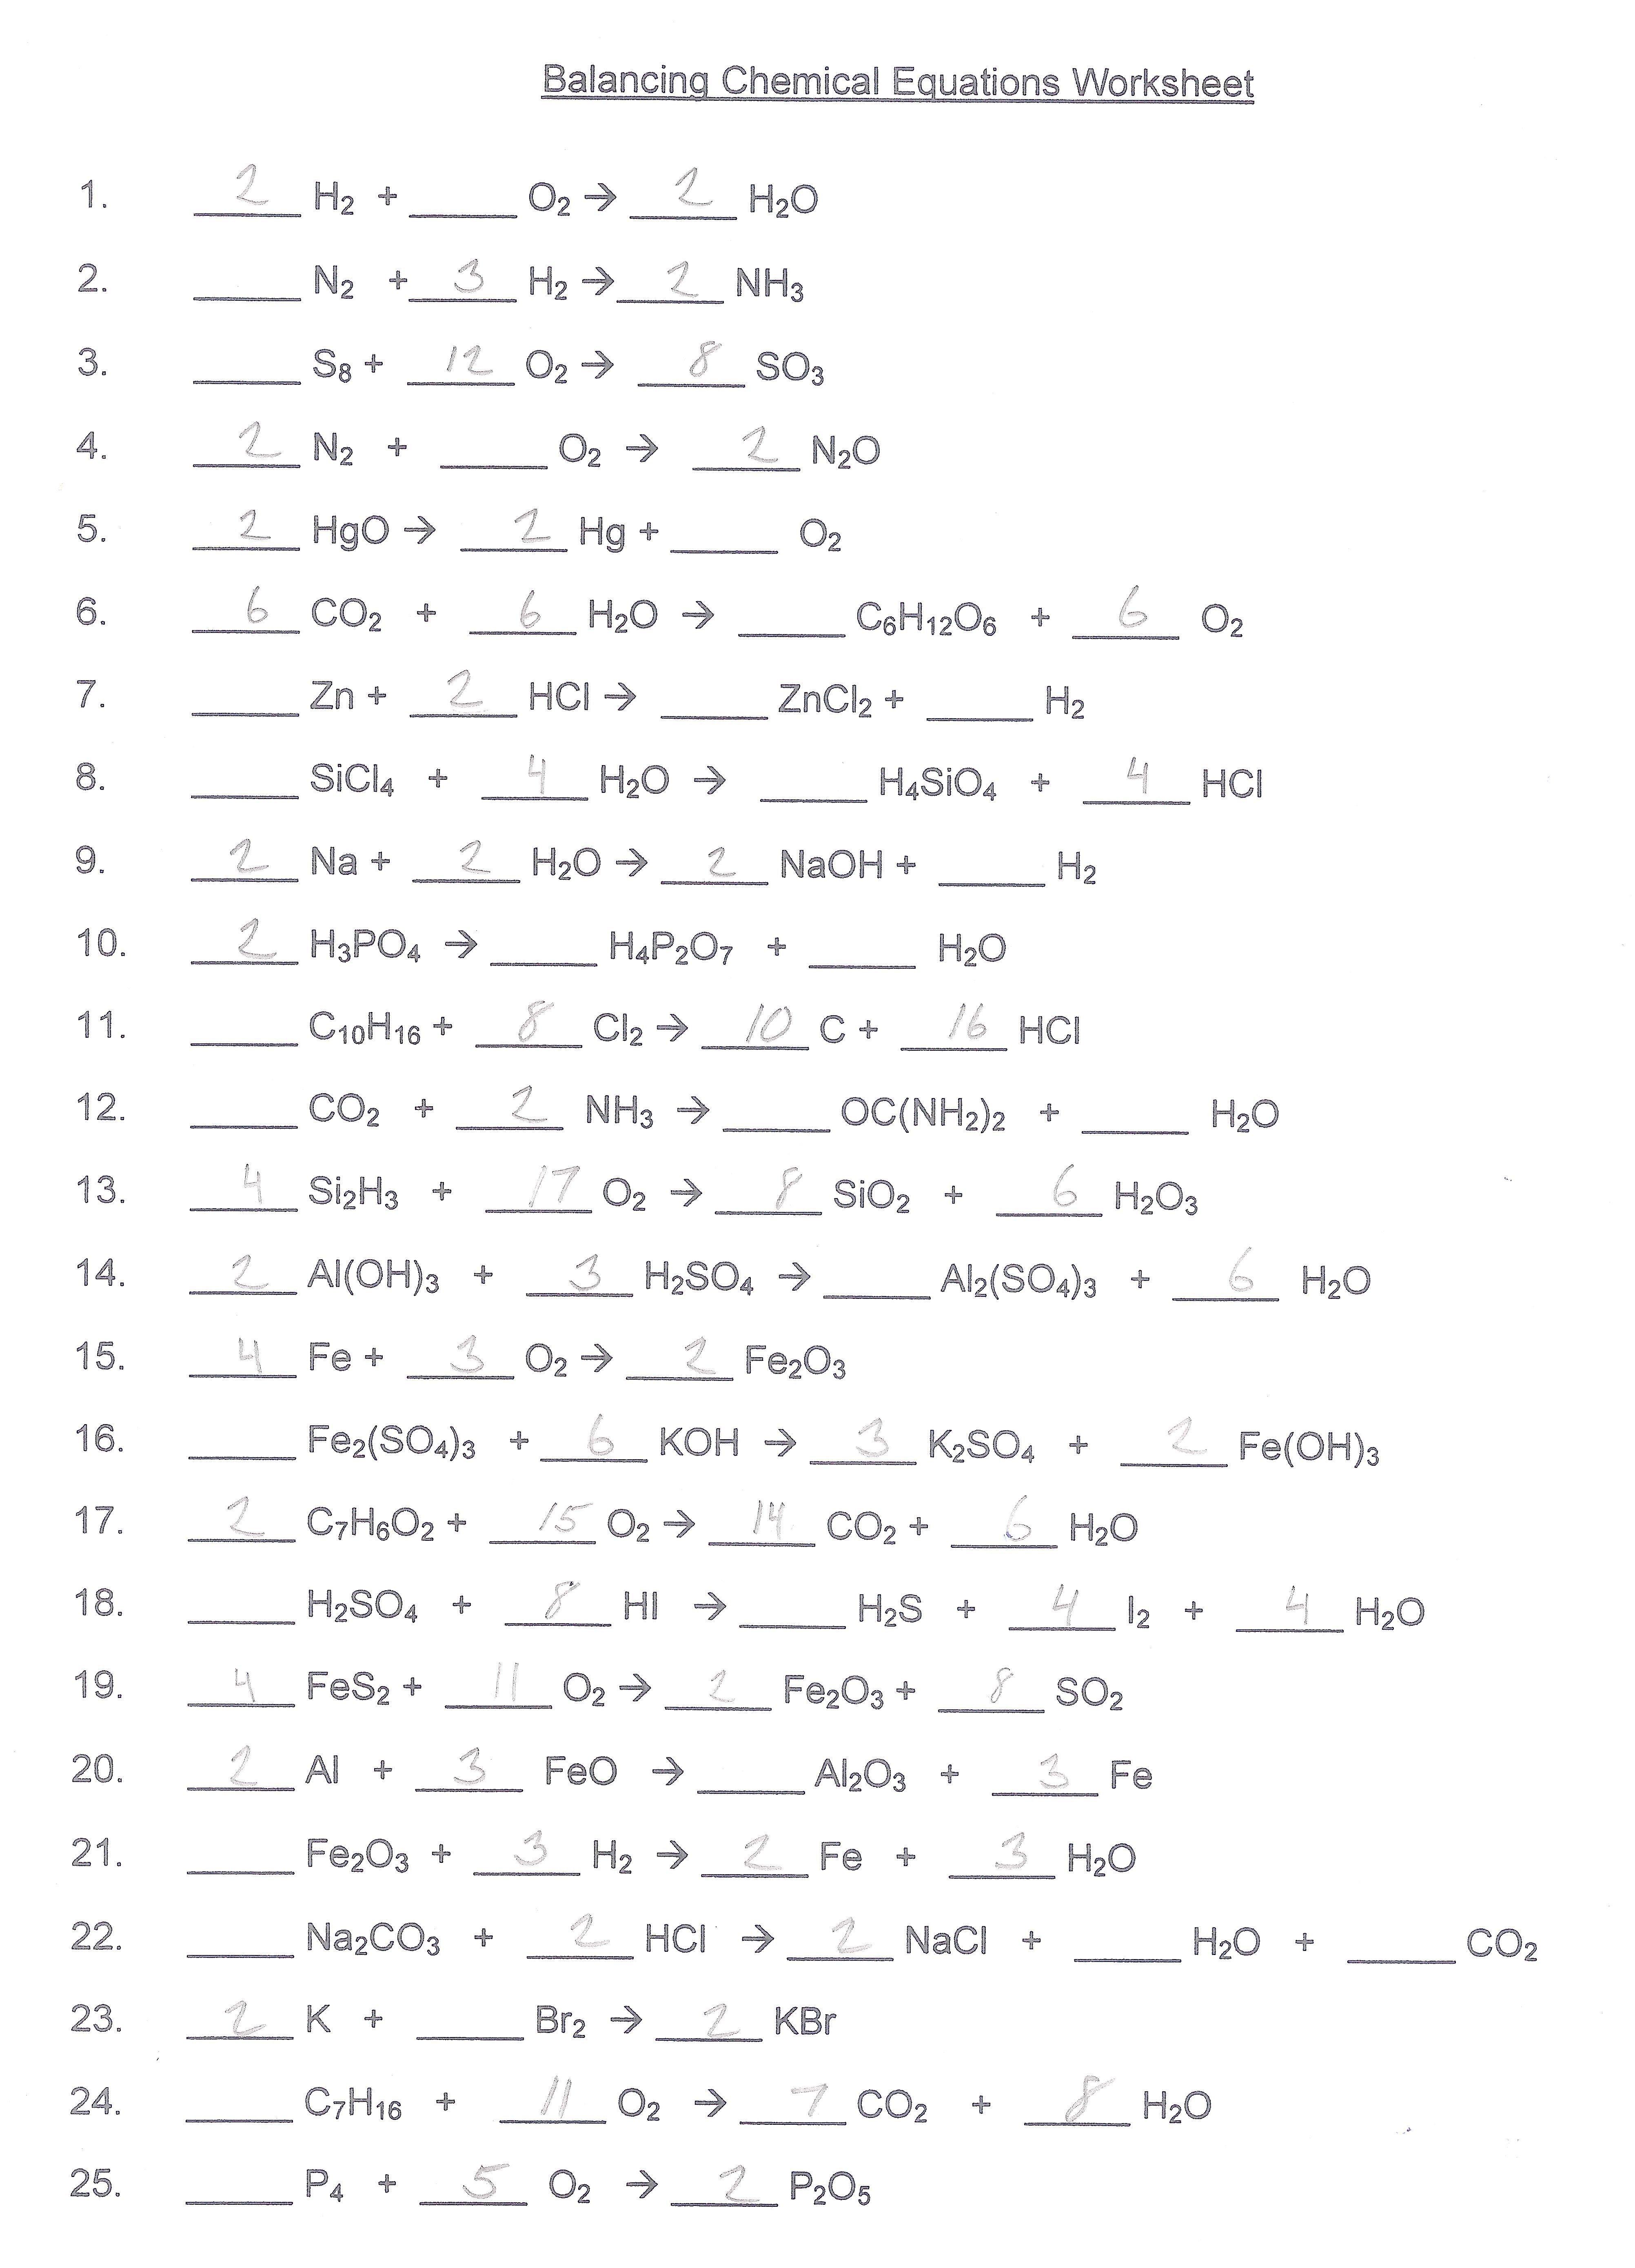 Balancing Equations Worksheet Chemistry Worksheets For All